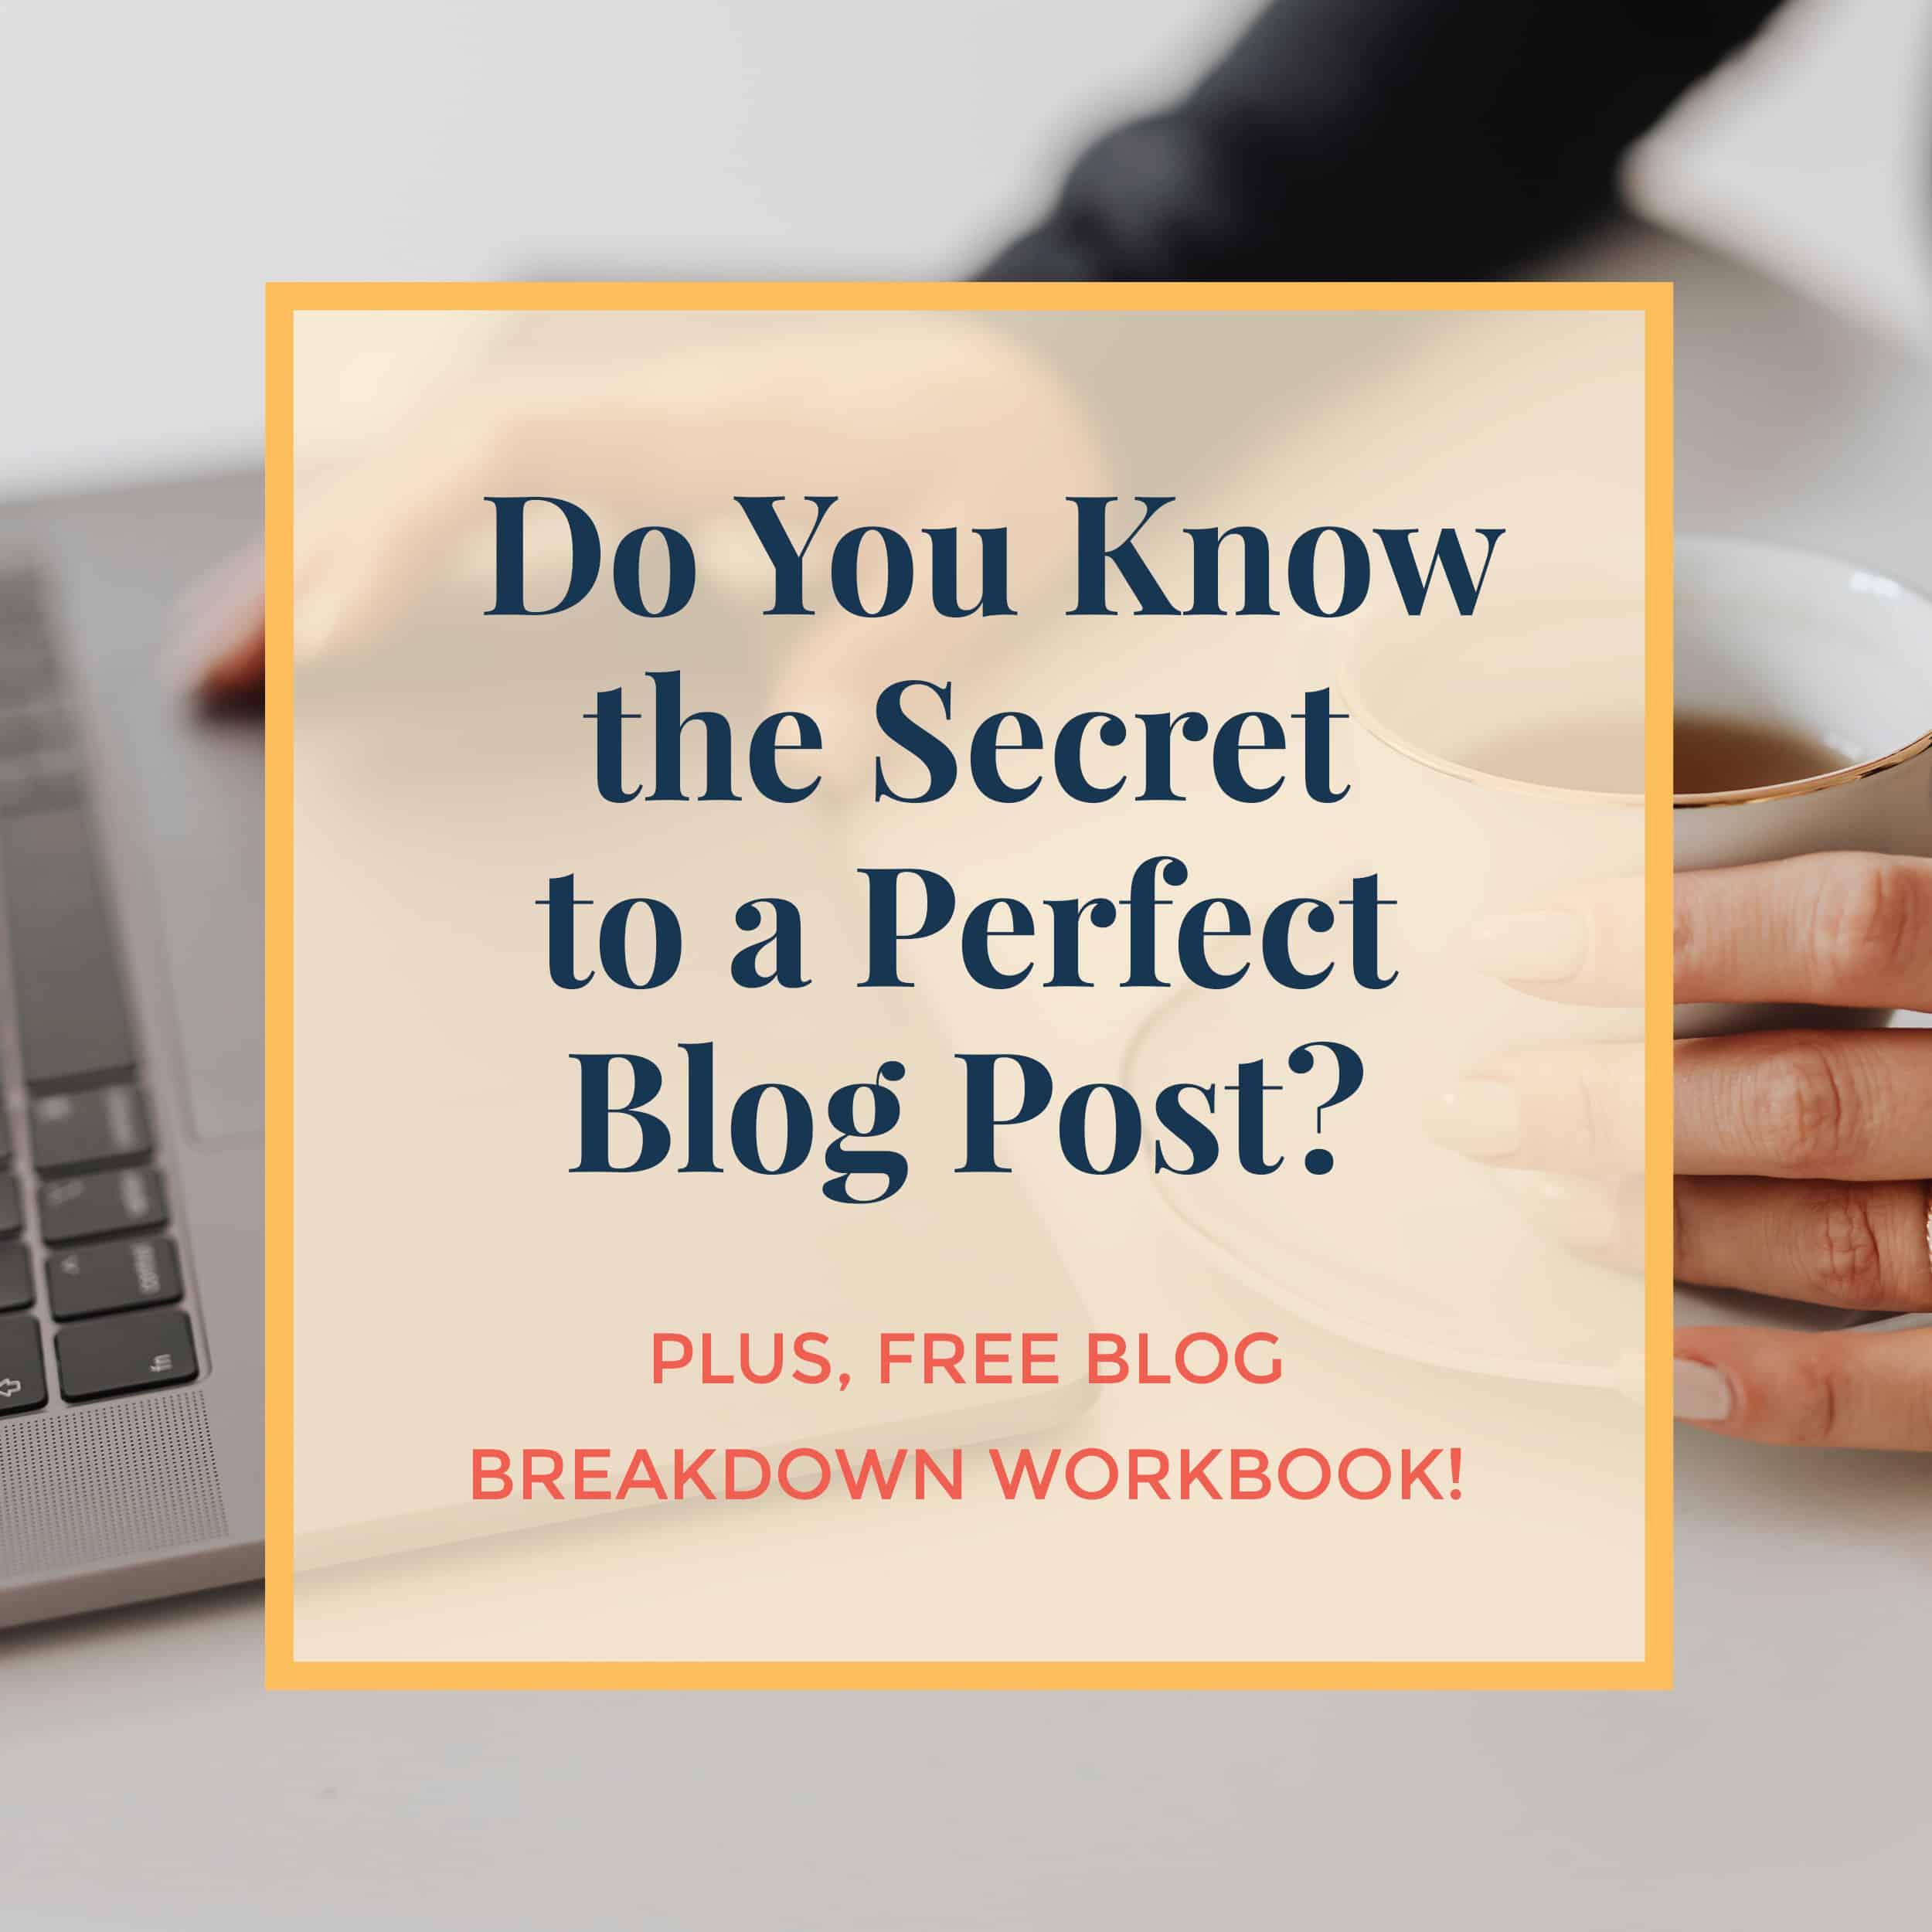 JLVAS-do-you-know-the-secret-to-a-perfect-blog-post-free-blog-breakdown-workbook